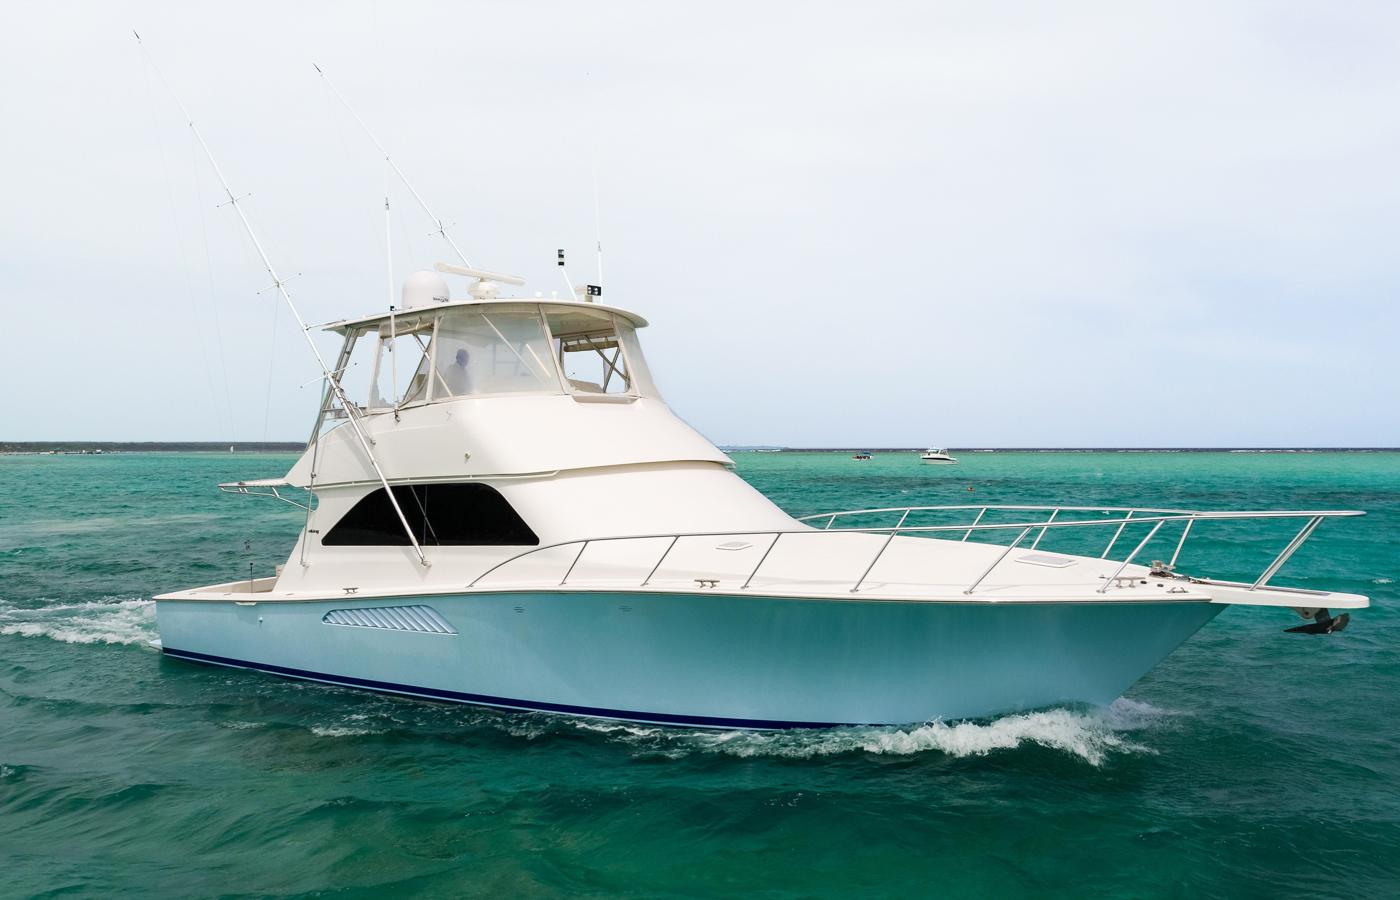 Top 5 Convertible Sportfishing Boats Under $500K